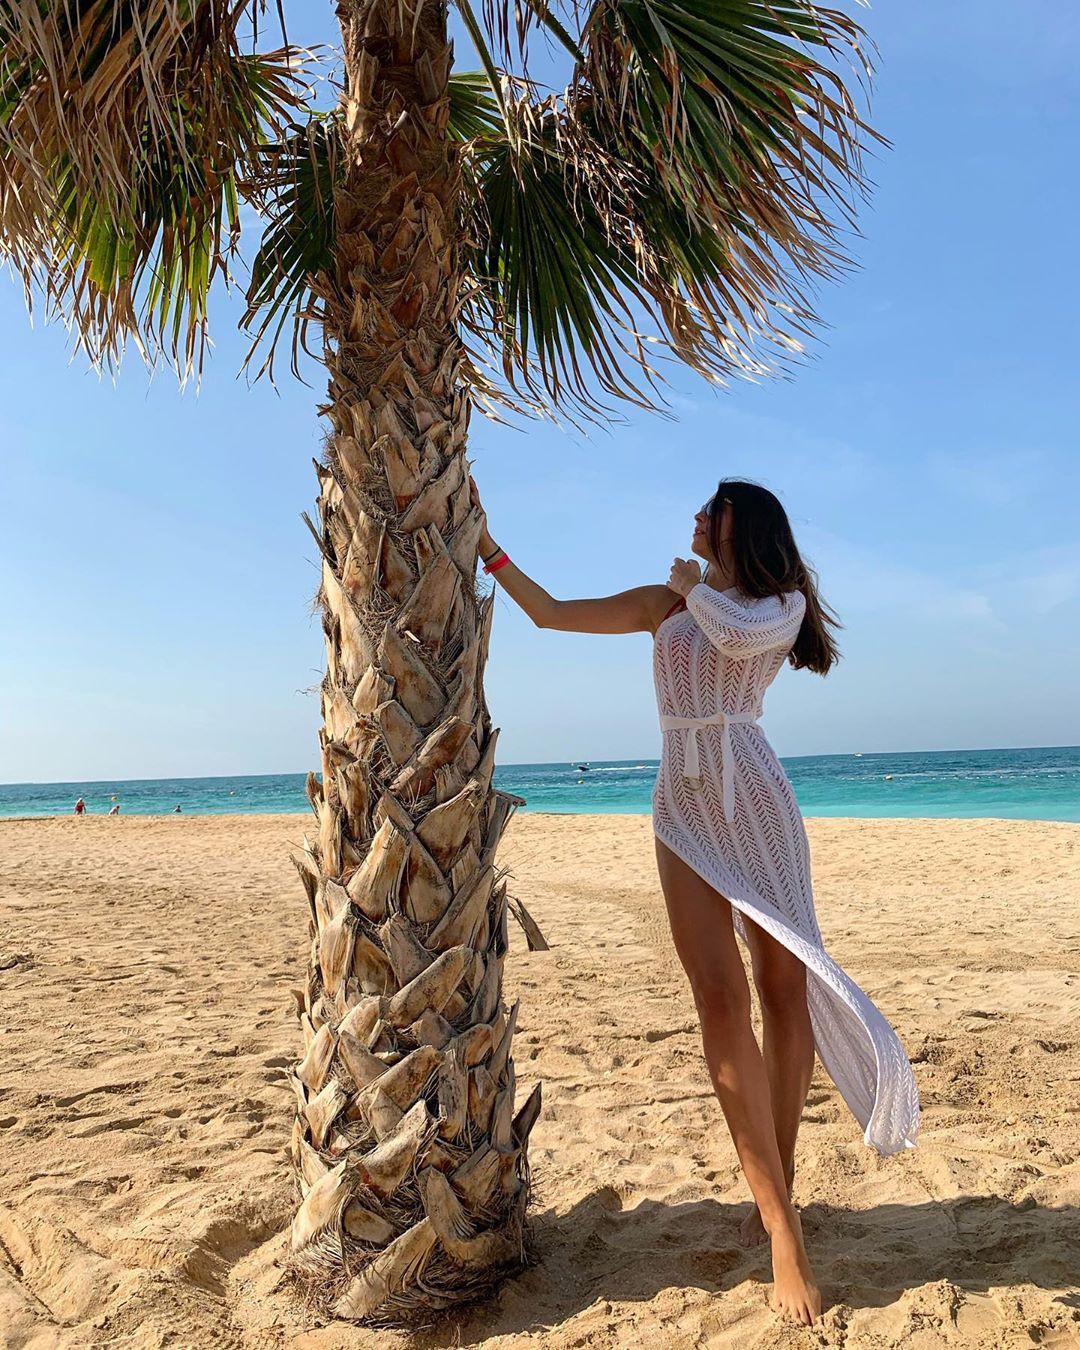 Stefanie Capshield, people in nature, people on beach, palm tree